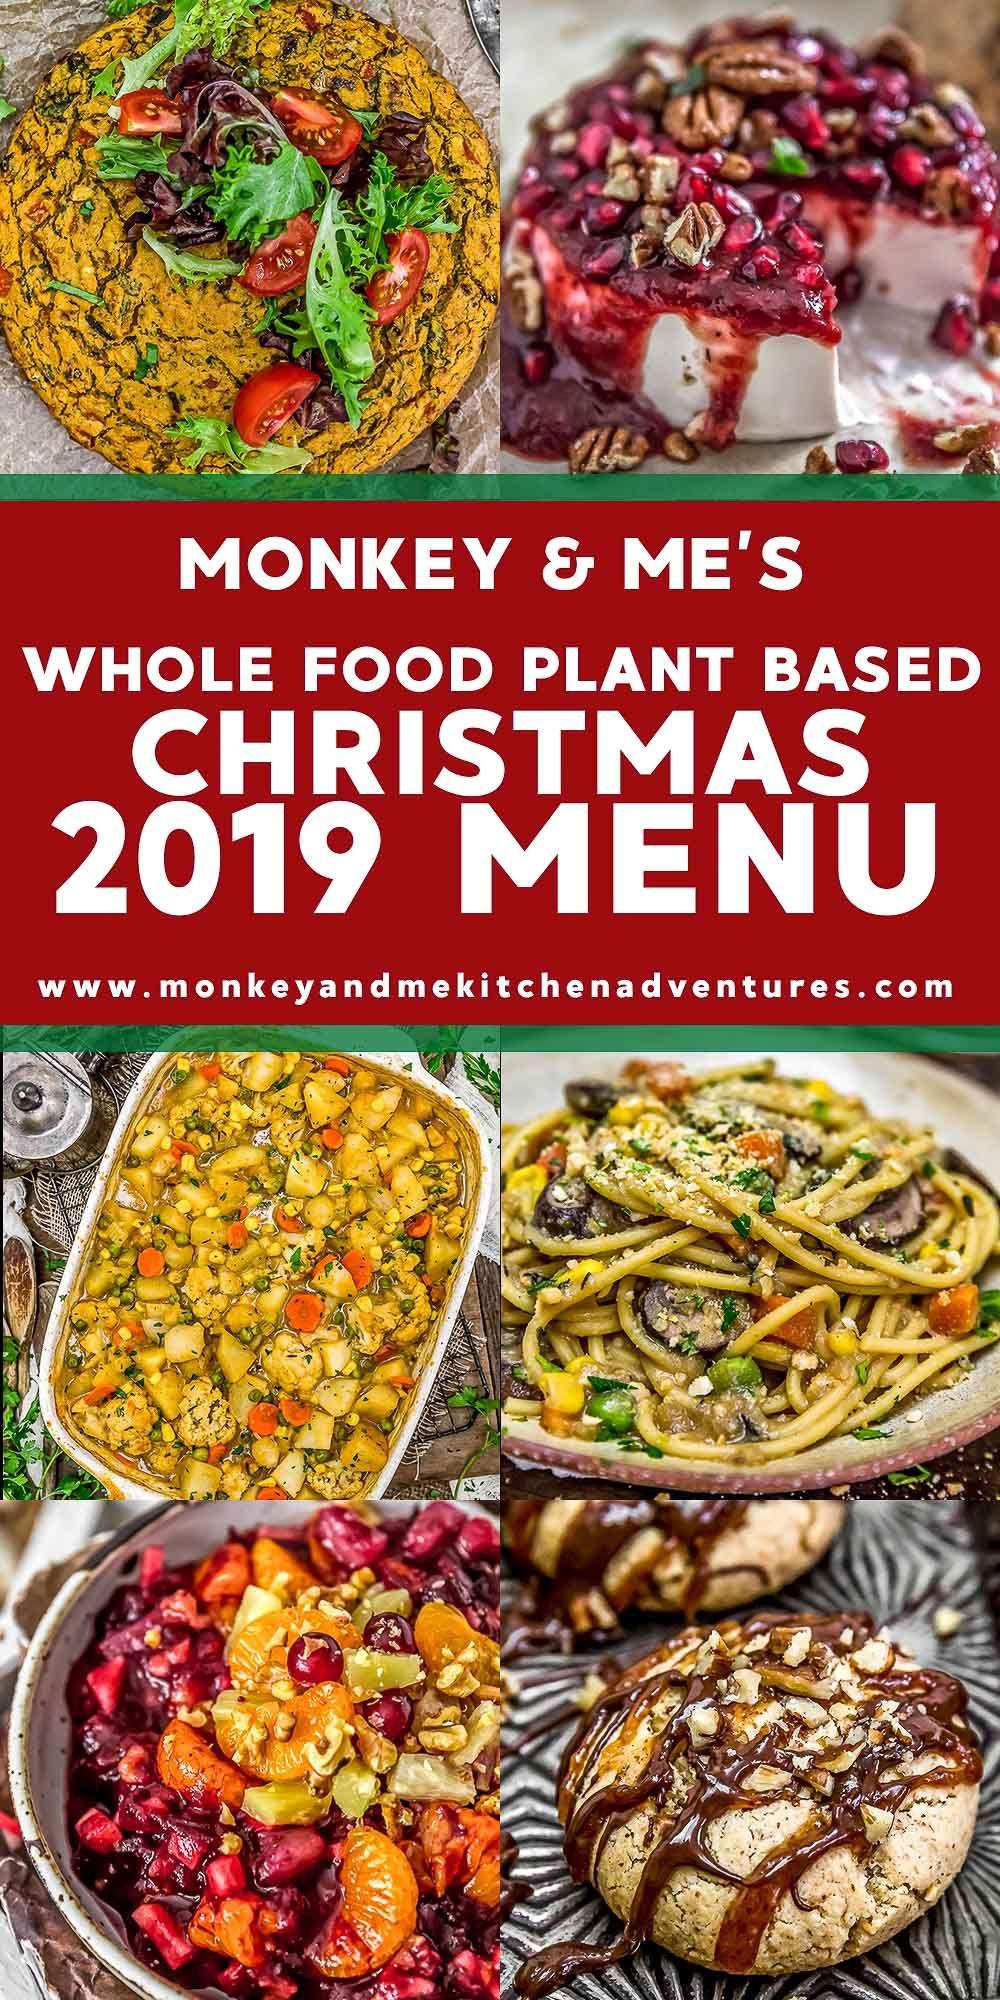 2019 Whole Food Plant Based Christmas Menu Whole food